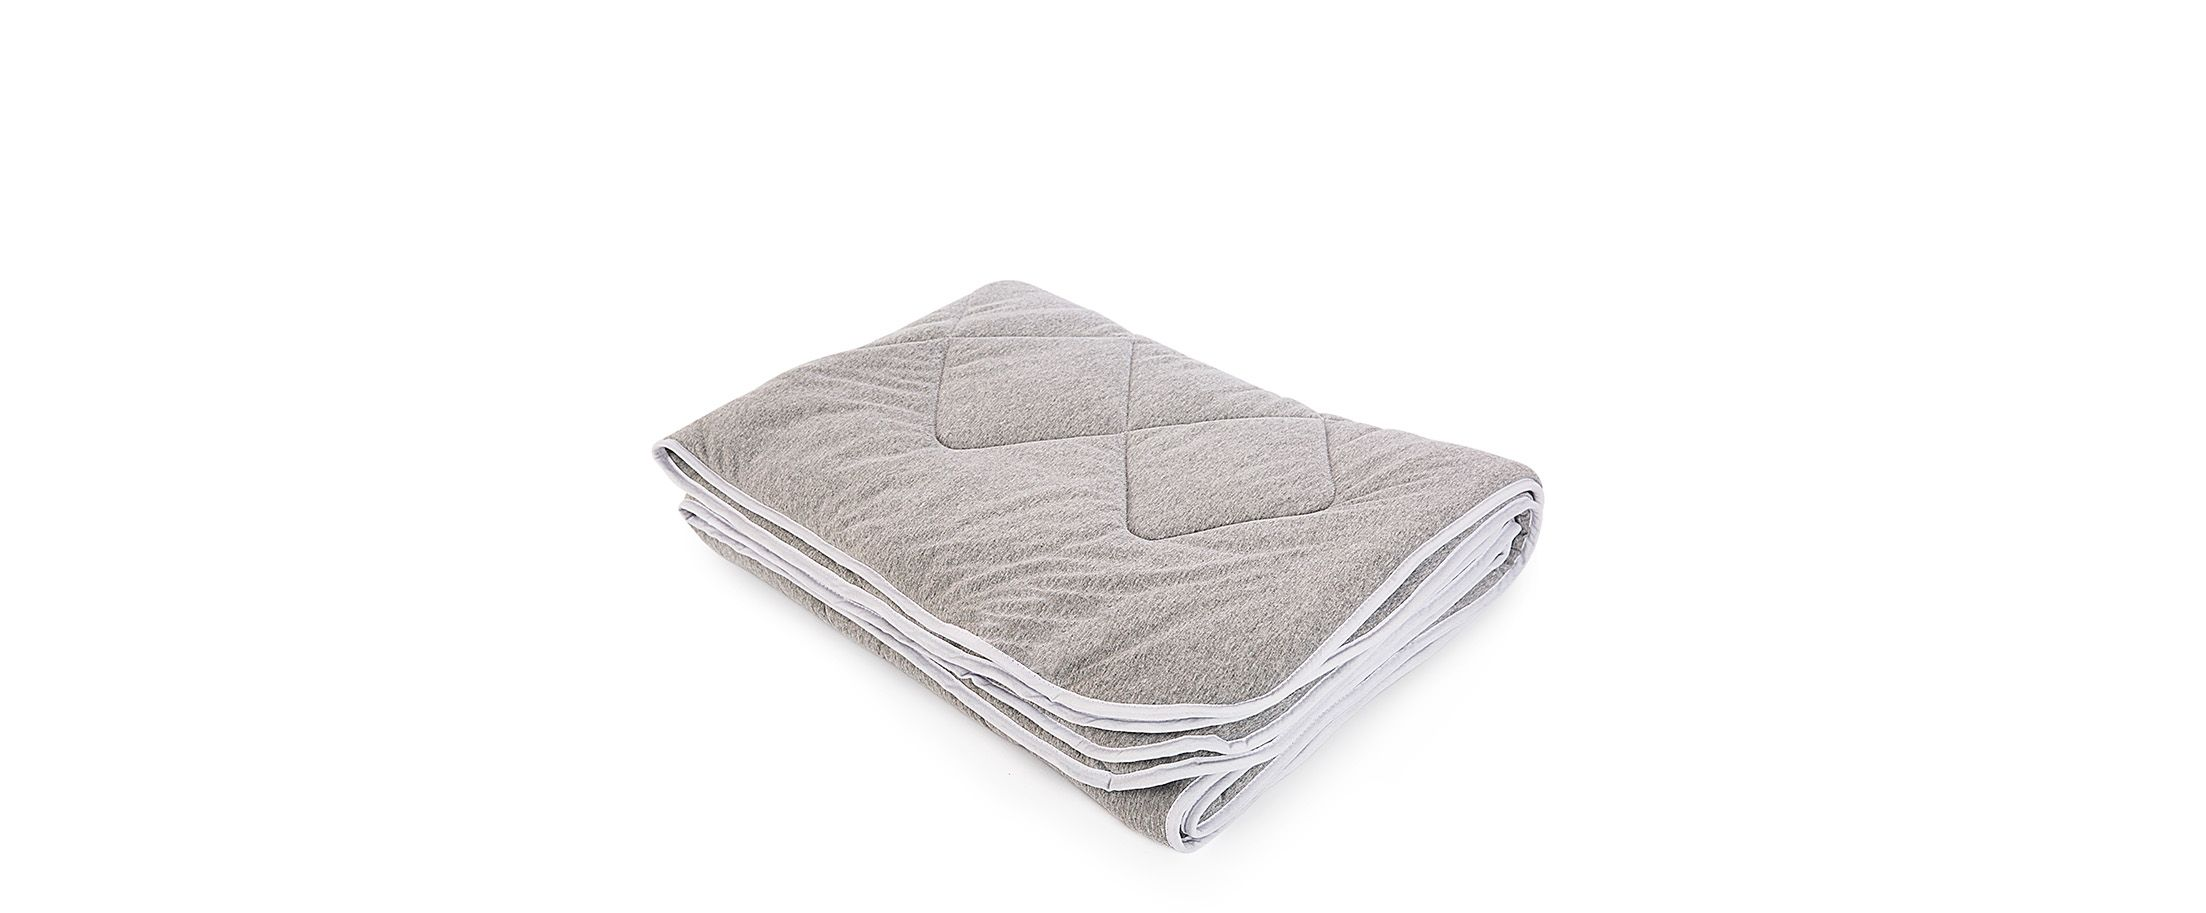 Одеяло трикотажное Бамбук серый меланж 140х205 Модель 4006Одеяло трикотажное Бамбук серый меланж 140х205 Модель 4006. Артикул К000750<br>